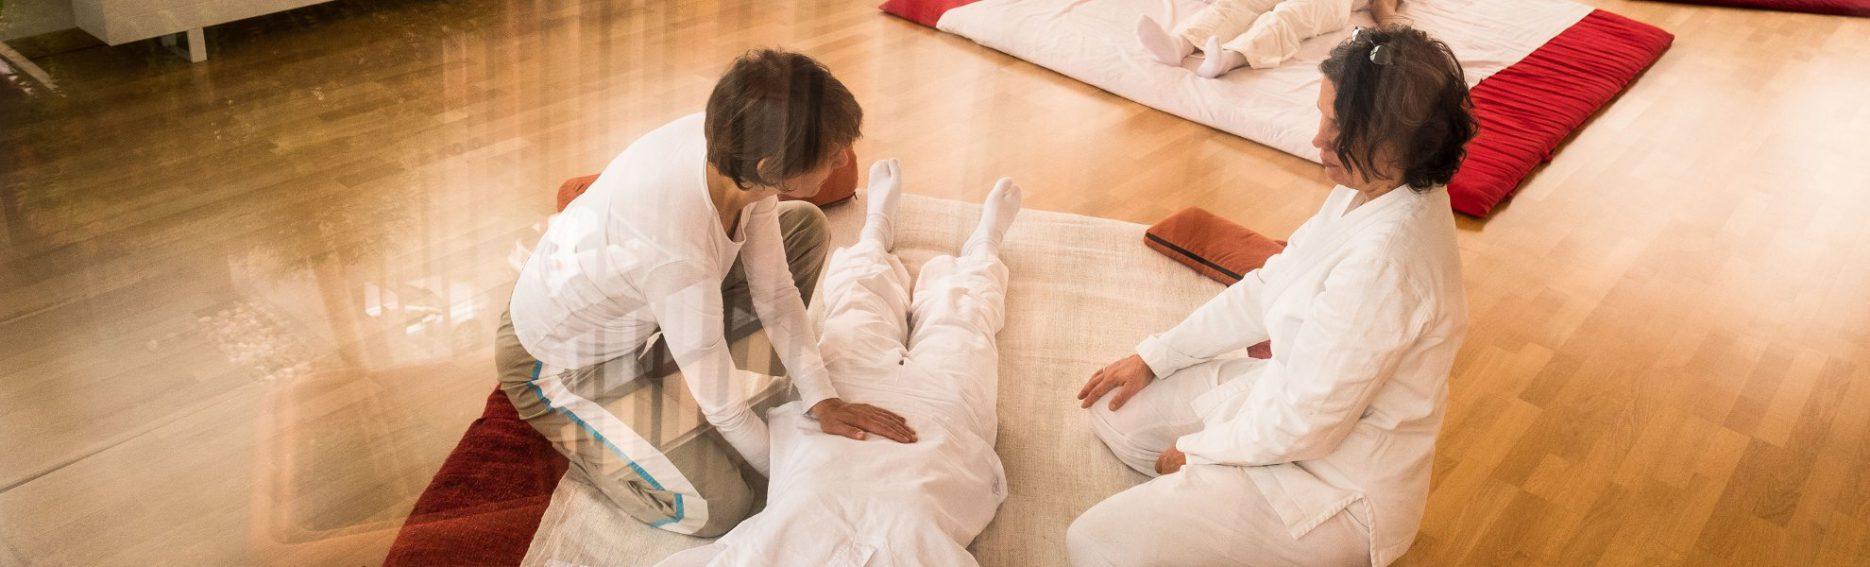 Shiatsu Einstieg Intensivwoche Stufe 1 – Bildungsurlaub